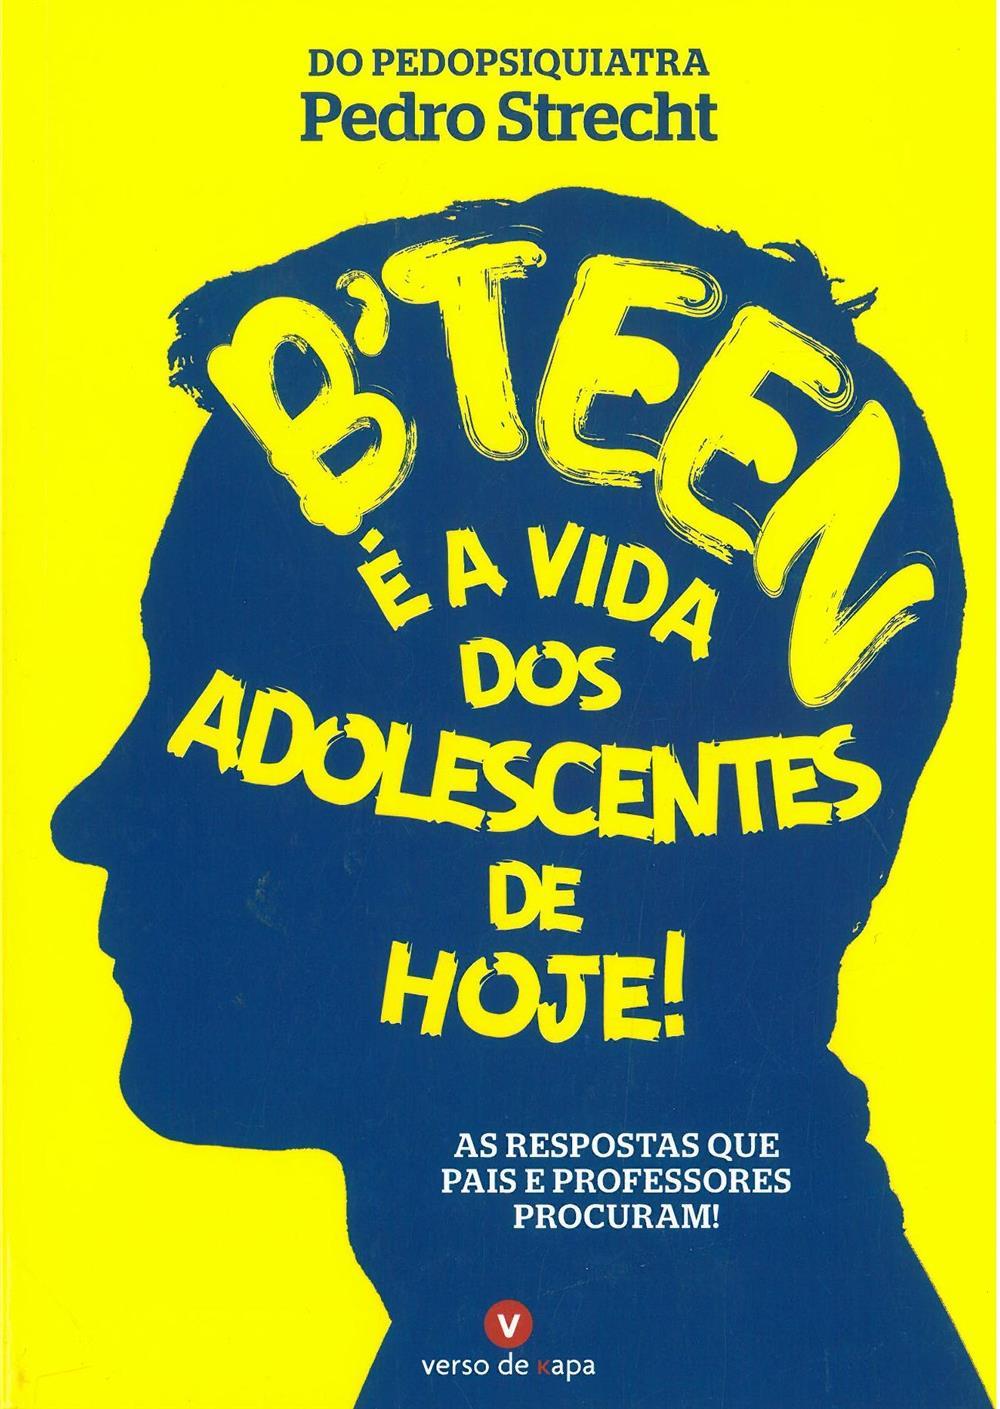 B'teen_ é a vida dos adolescentes de hoje_.jpg